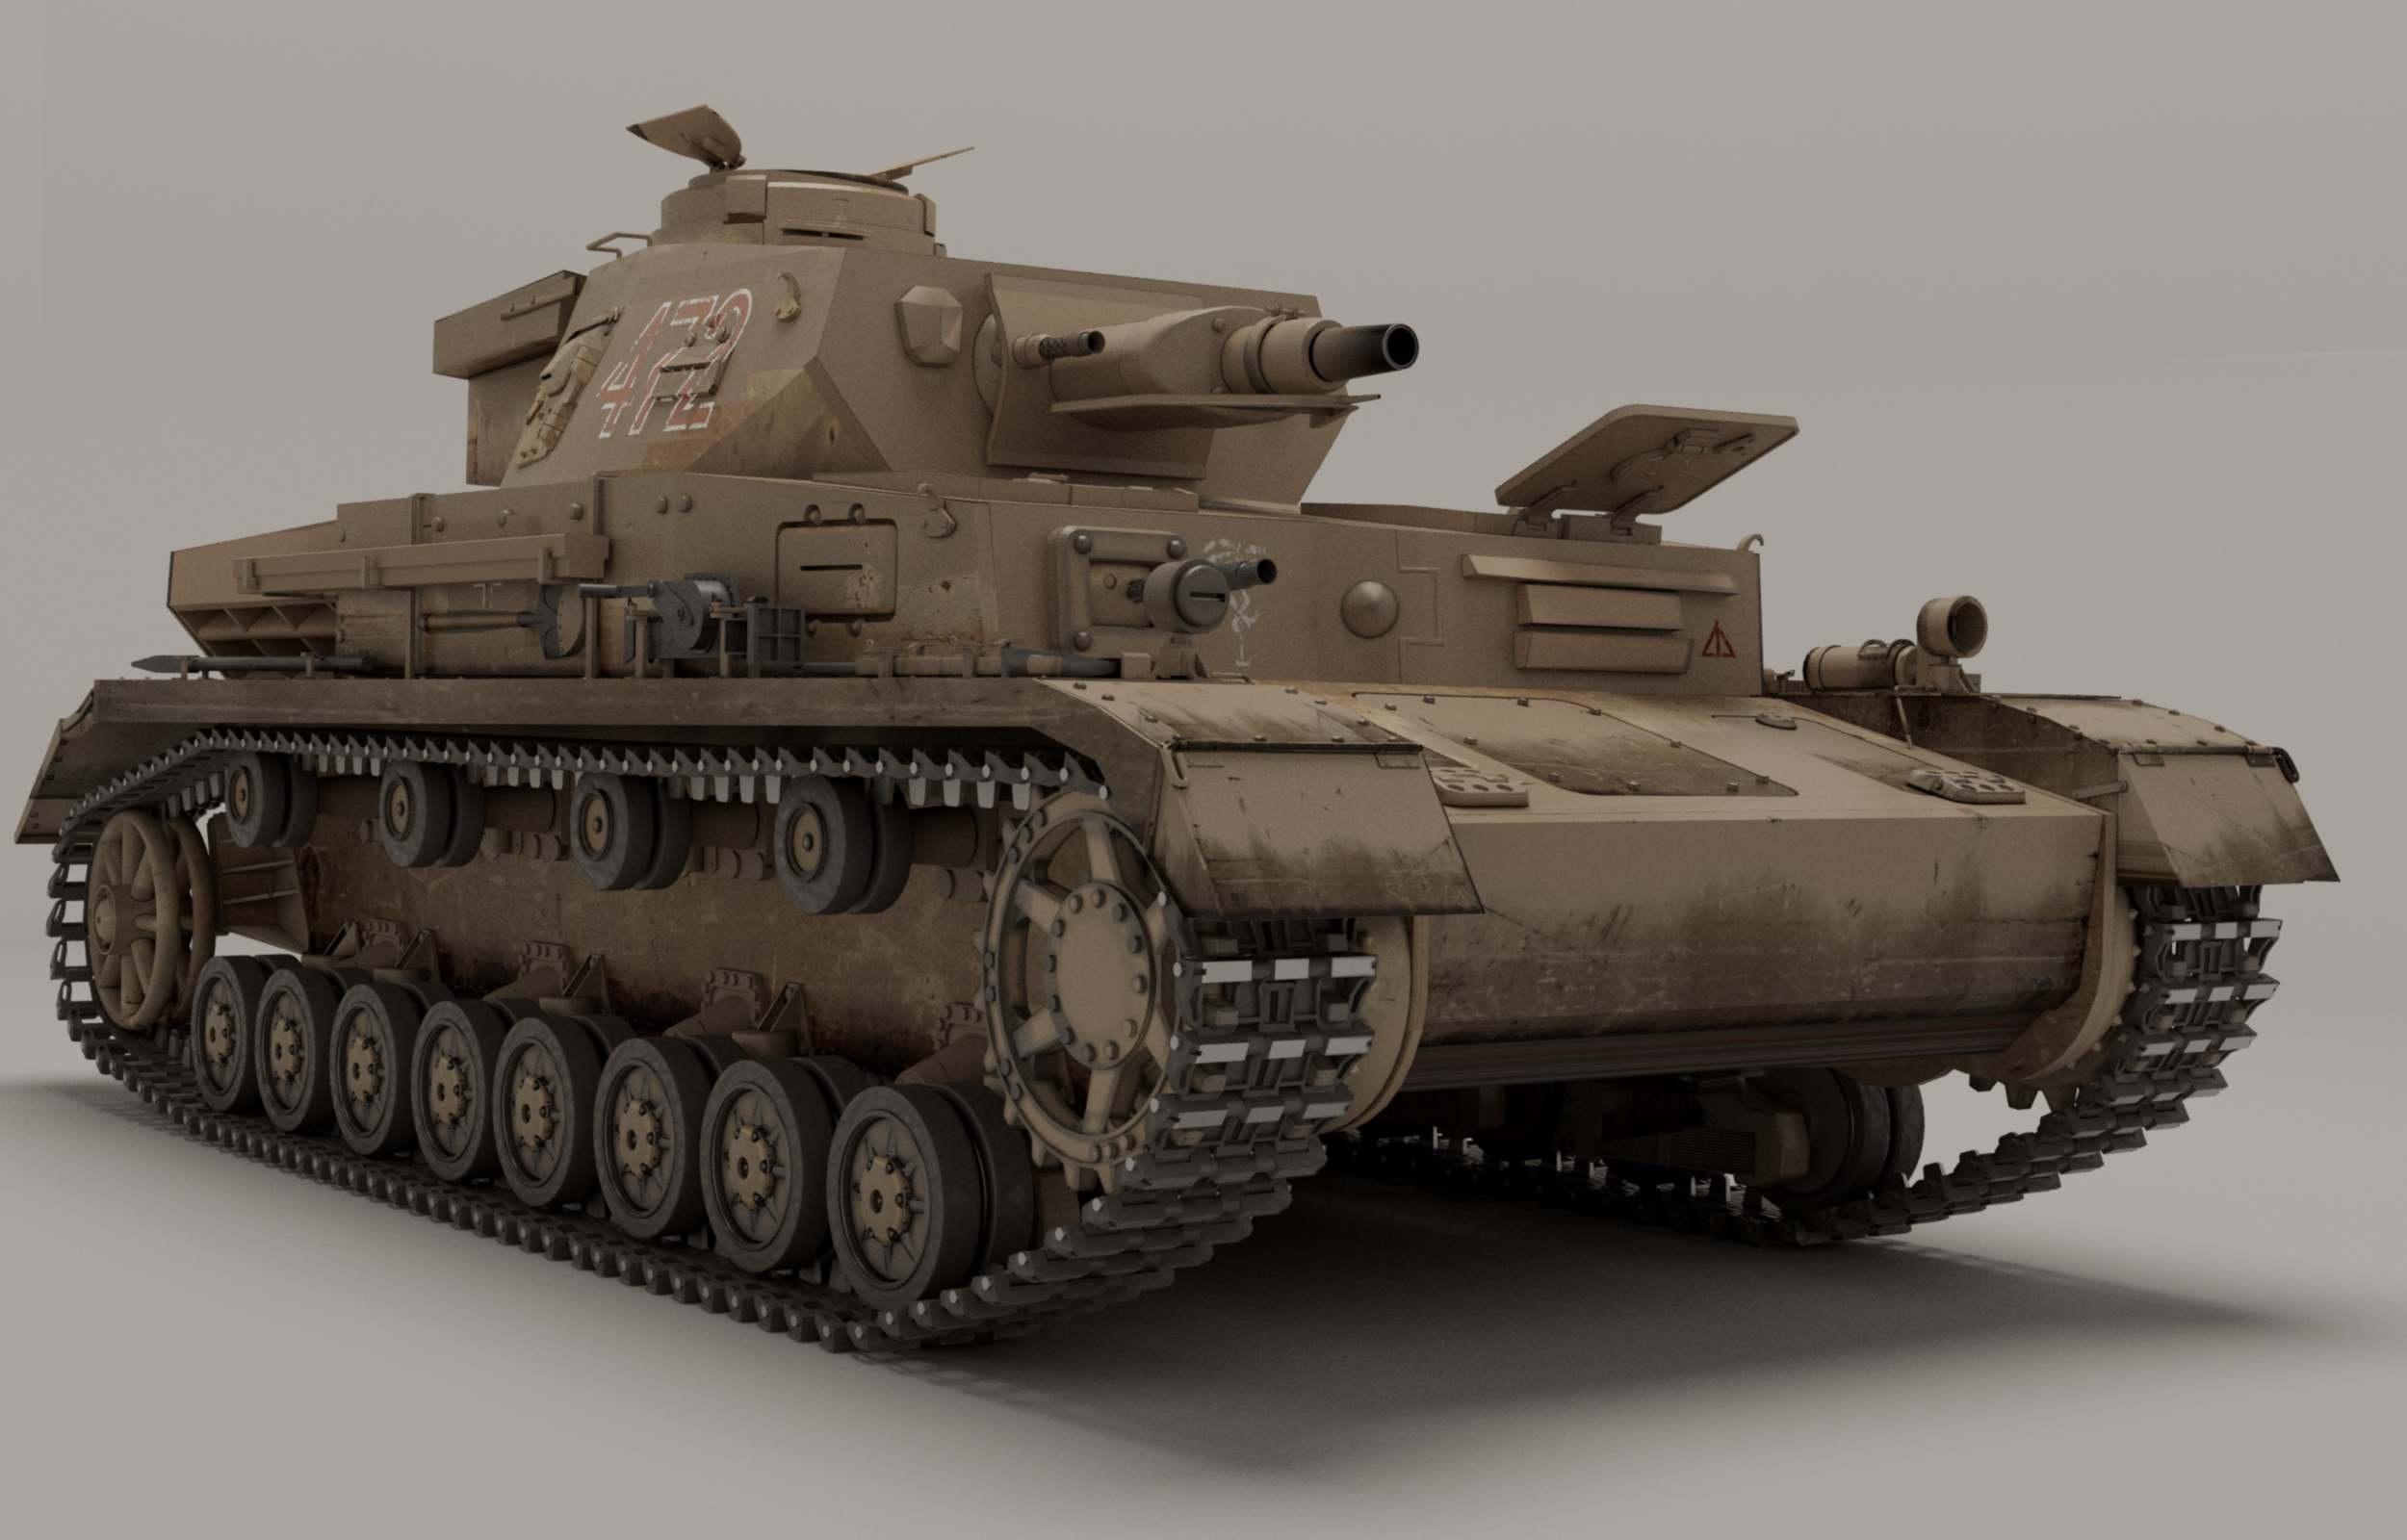 Panzer IV HD Wallpaper | Background Image | 2000x1226 | ID